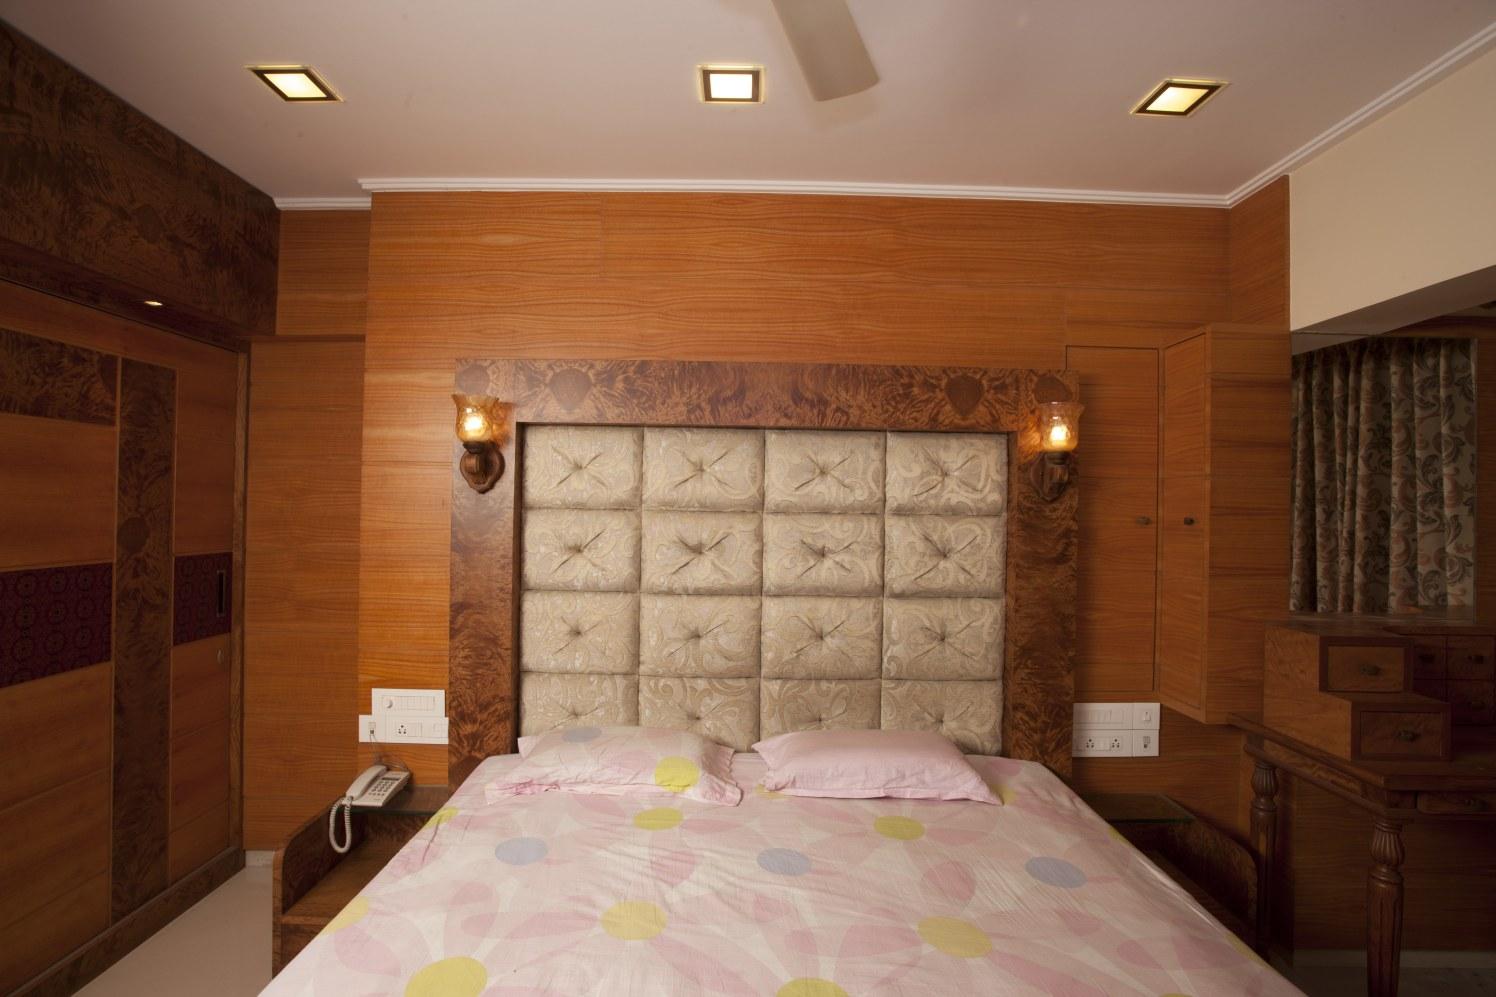 Luxurious Bedroom by Plus One Interiors Bedroom Contemporary | Interior Design Photos & Ideas